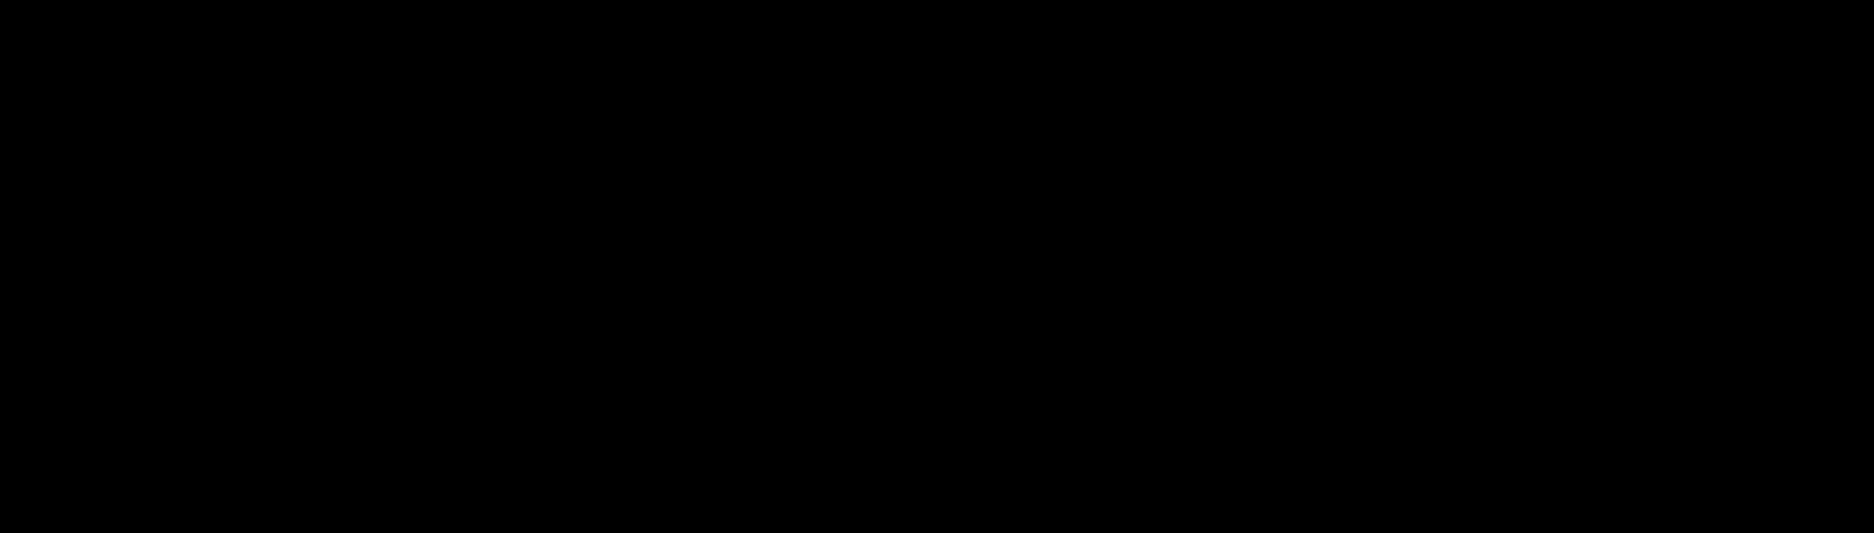 image88.png